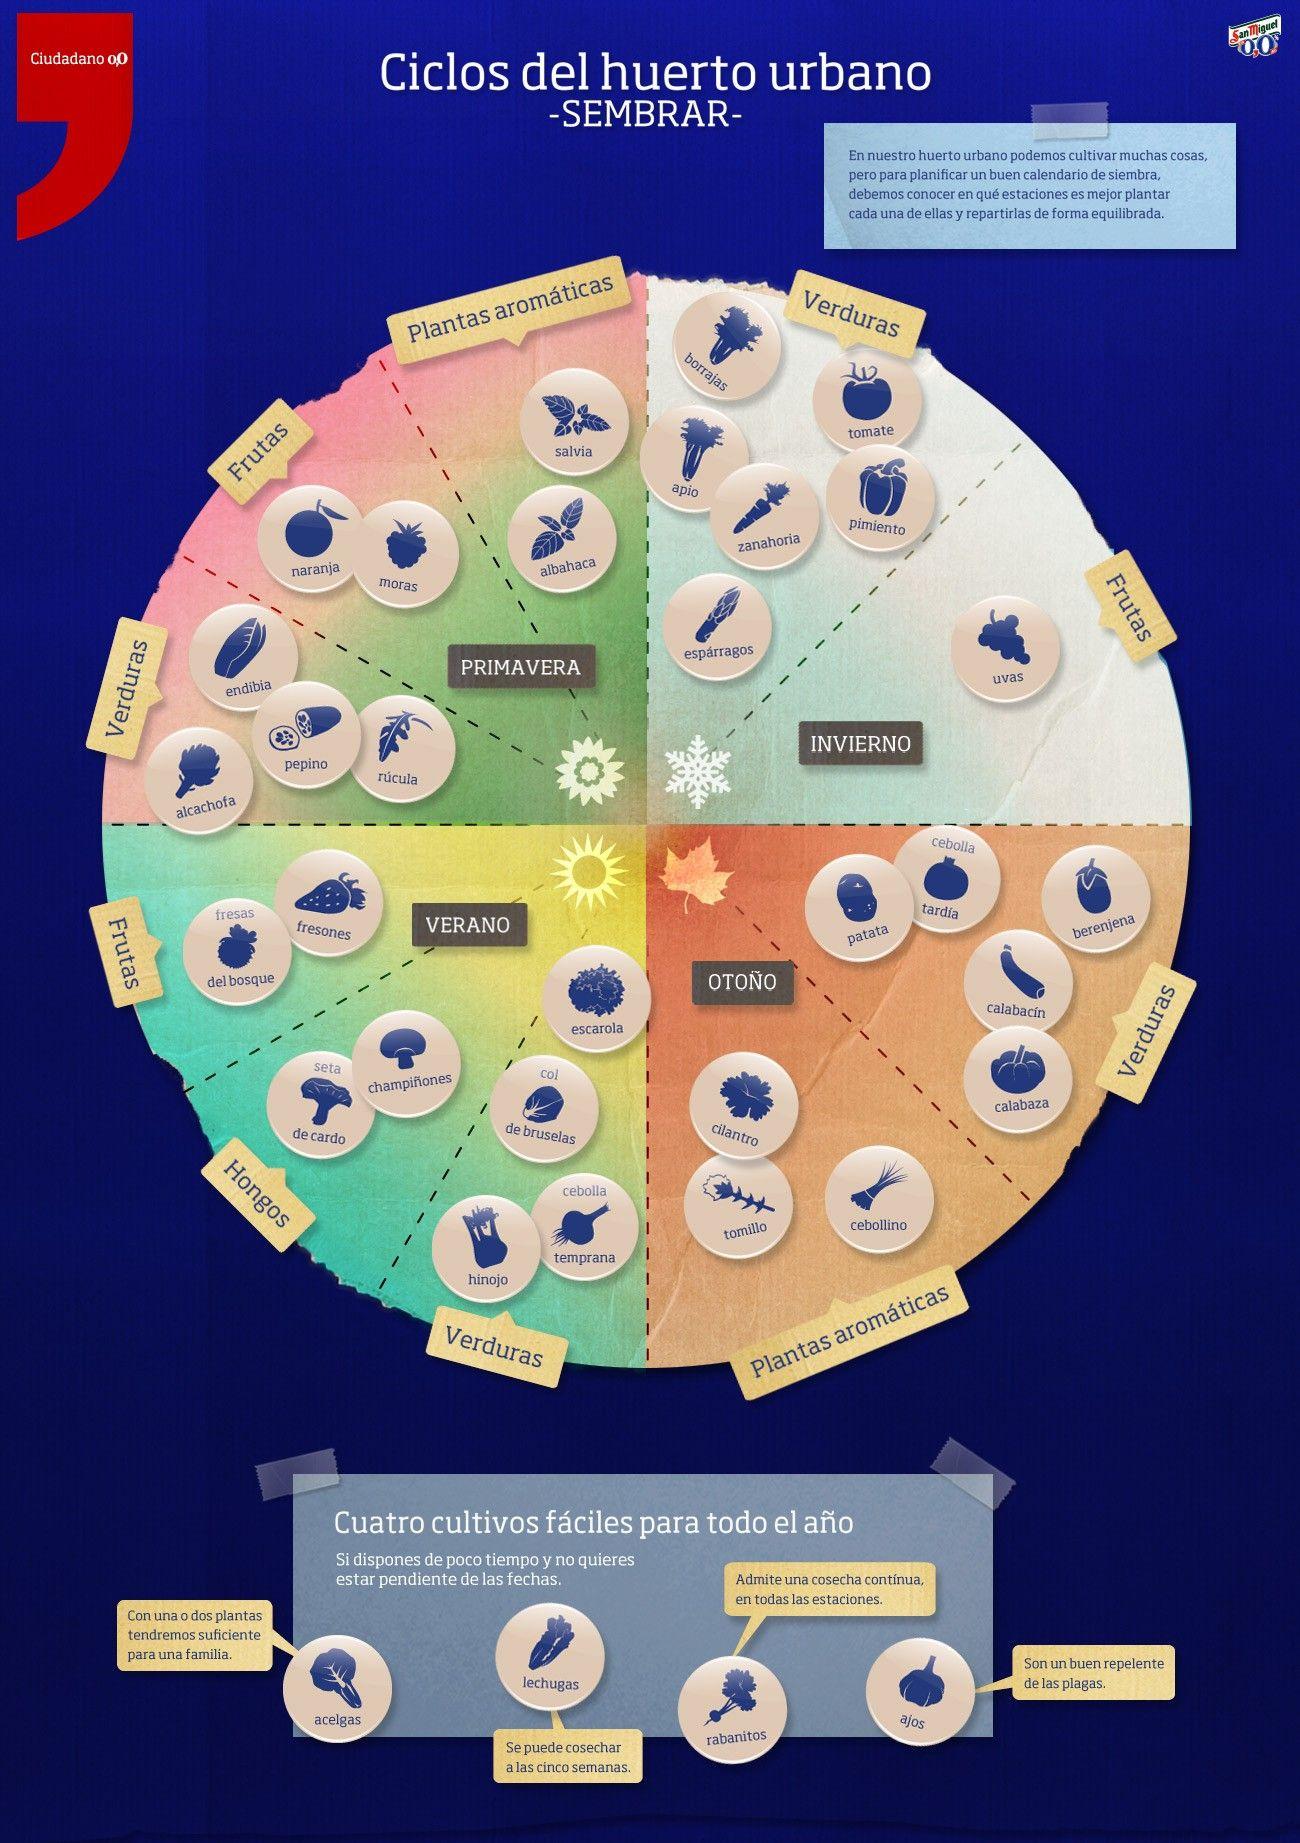 Infograf a ciclos del huerto sembrar asociaci n de for Asociacion de plantas en el huerto